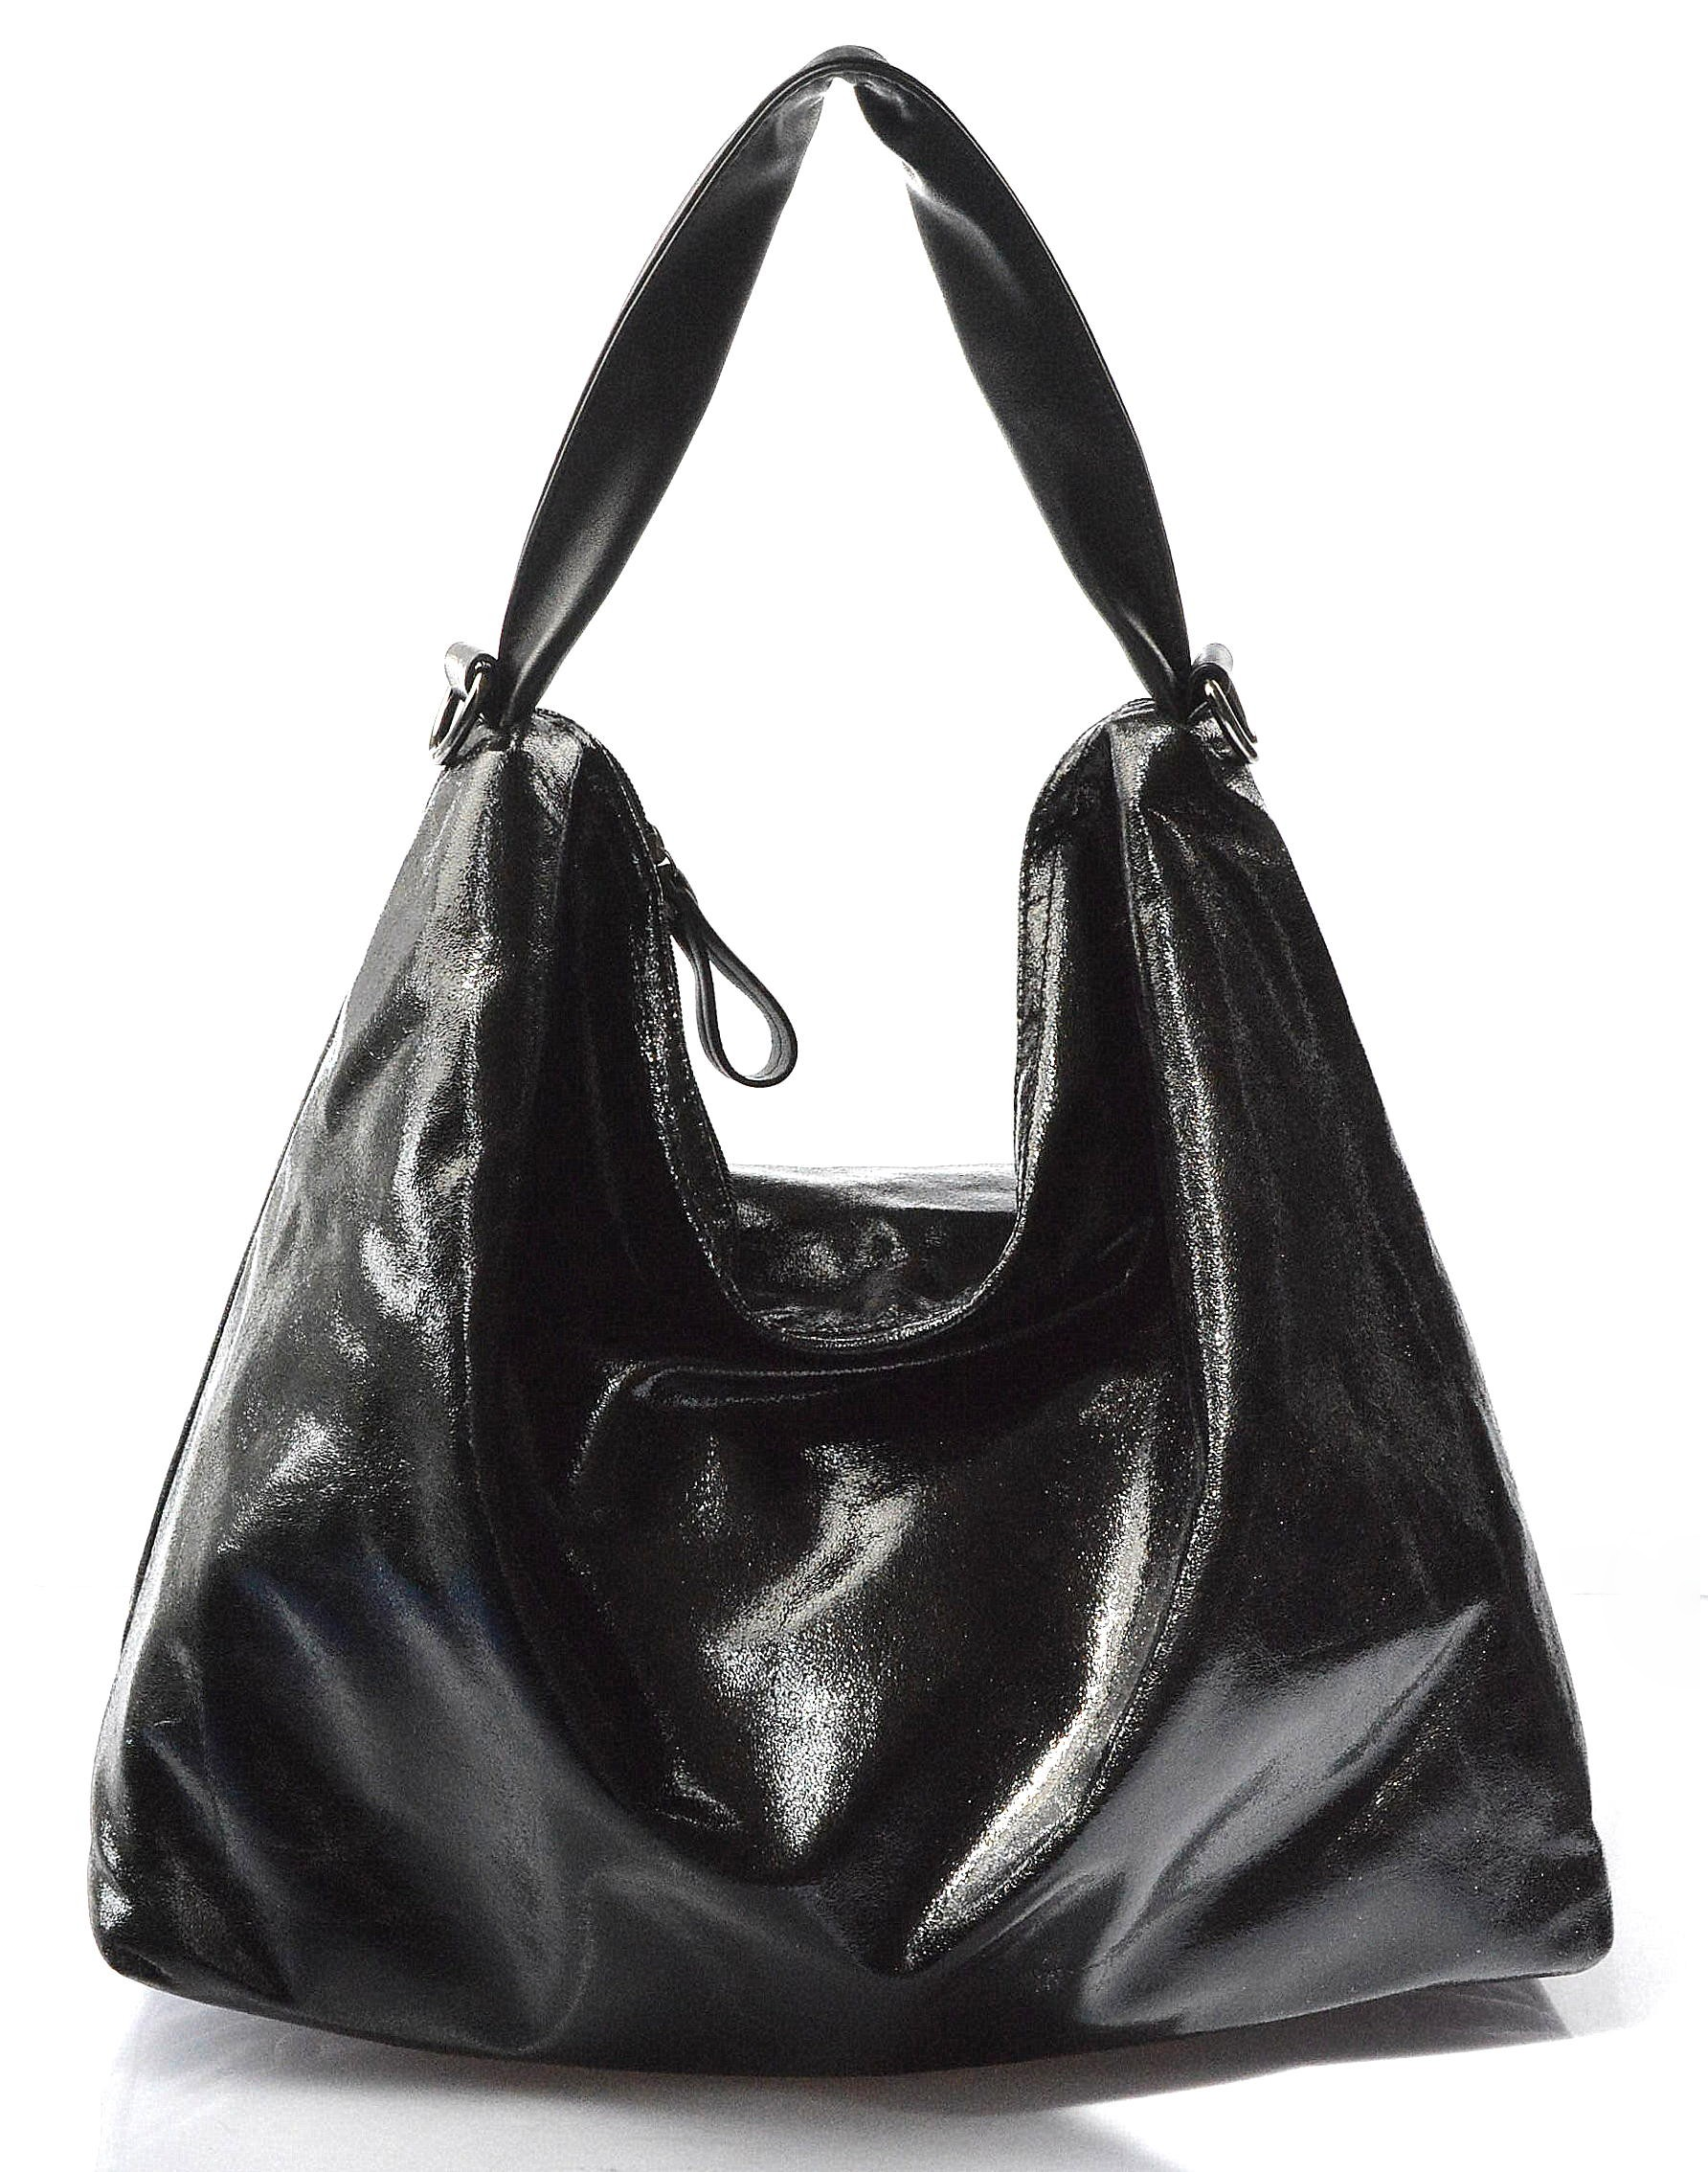 73a6872de3 moderní lesklá černá kabelka na rameno erin - KabelkyZeSveta